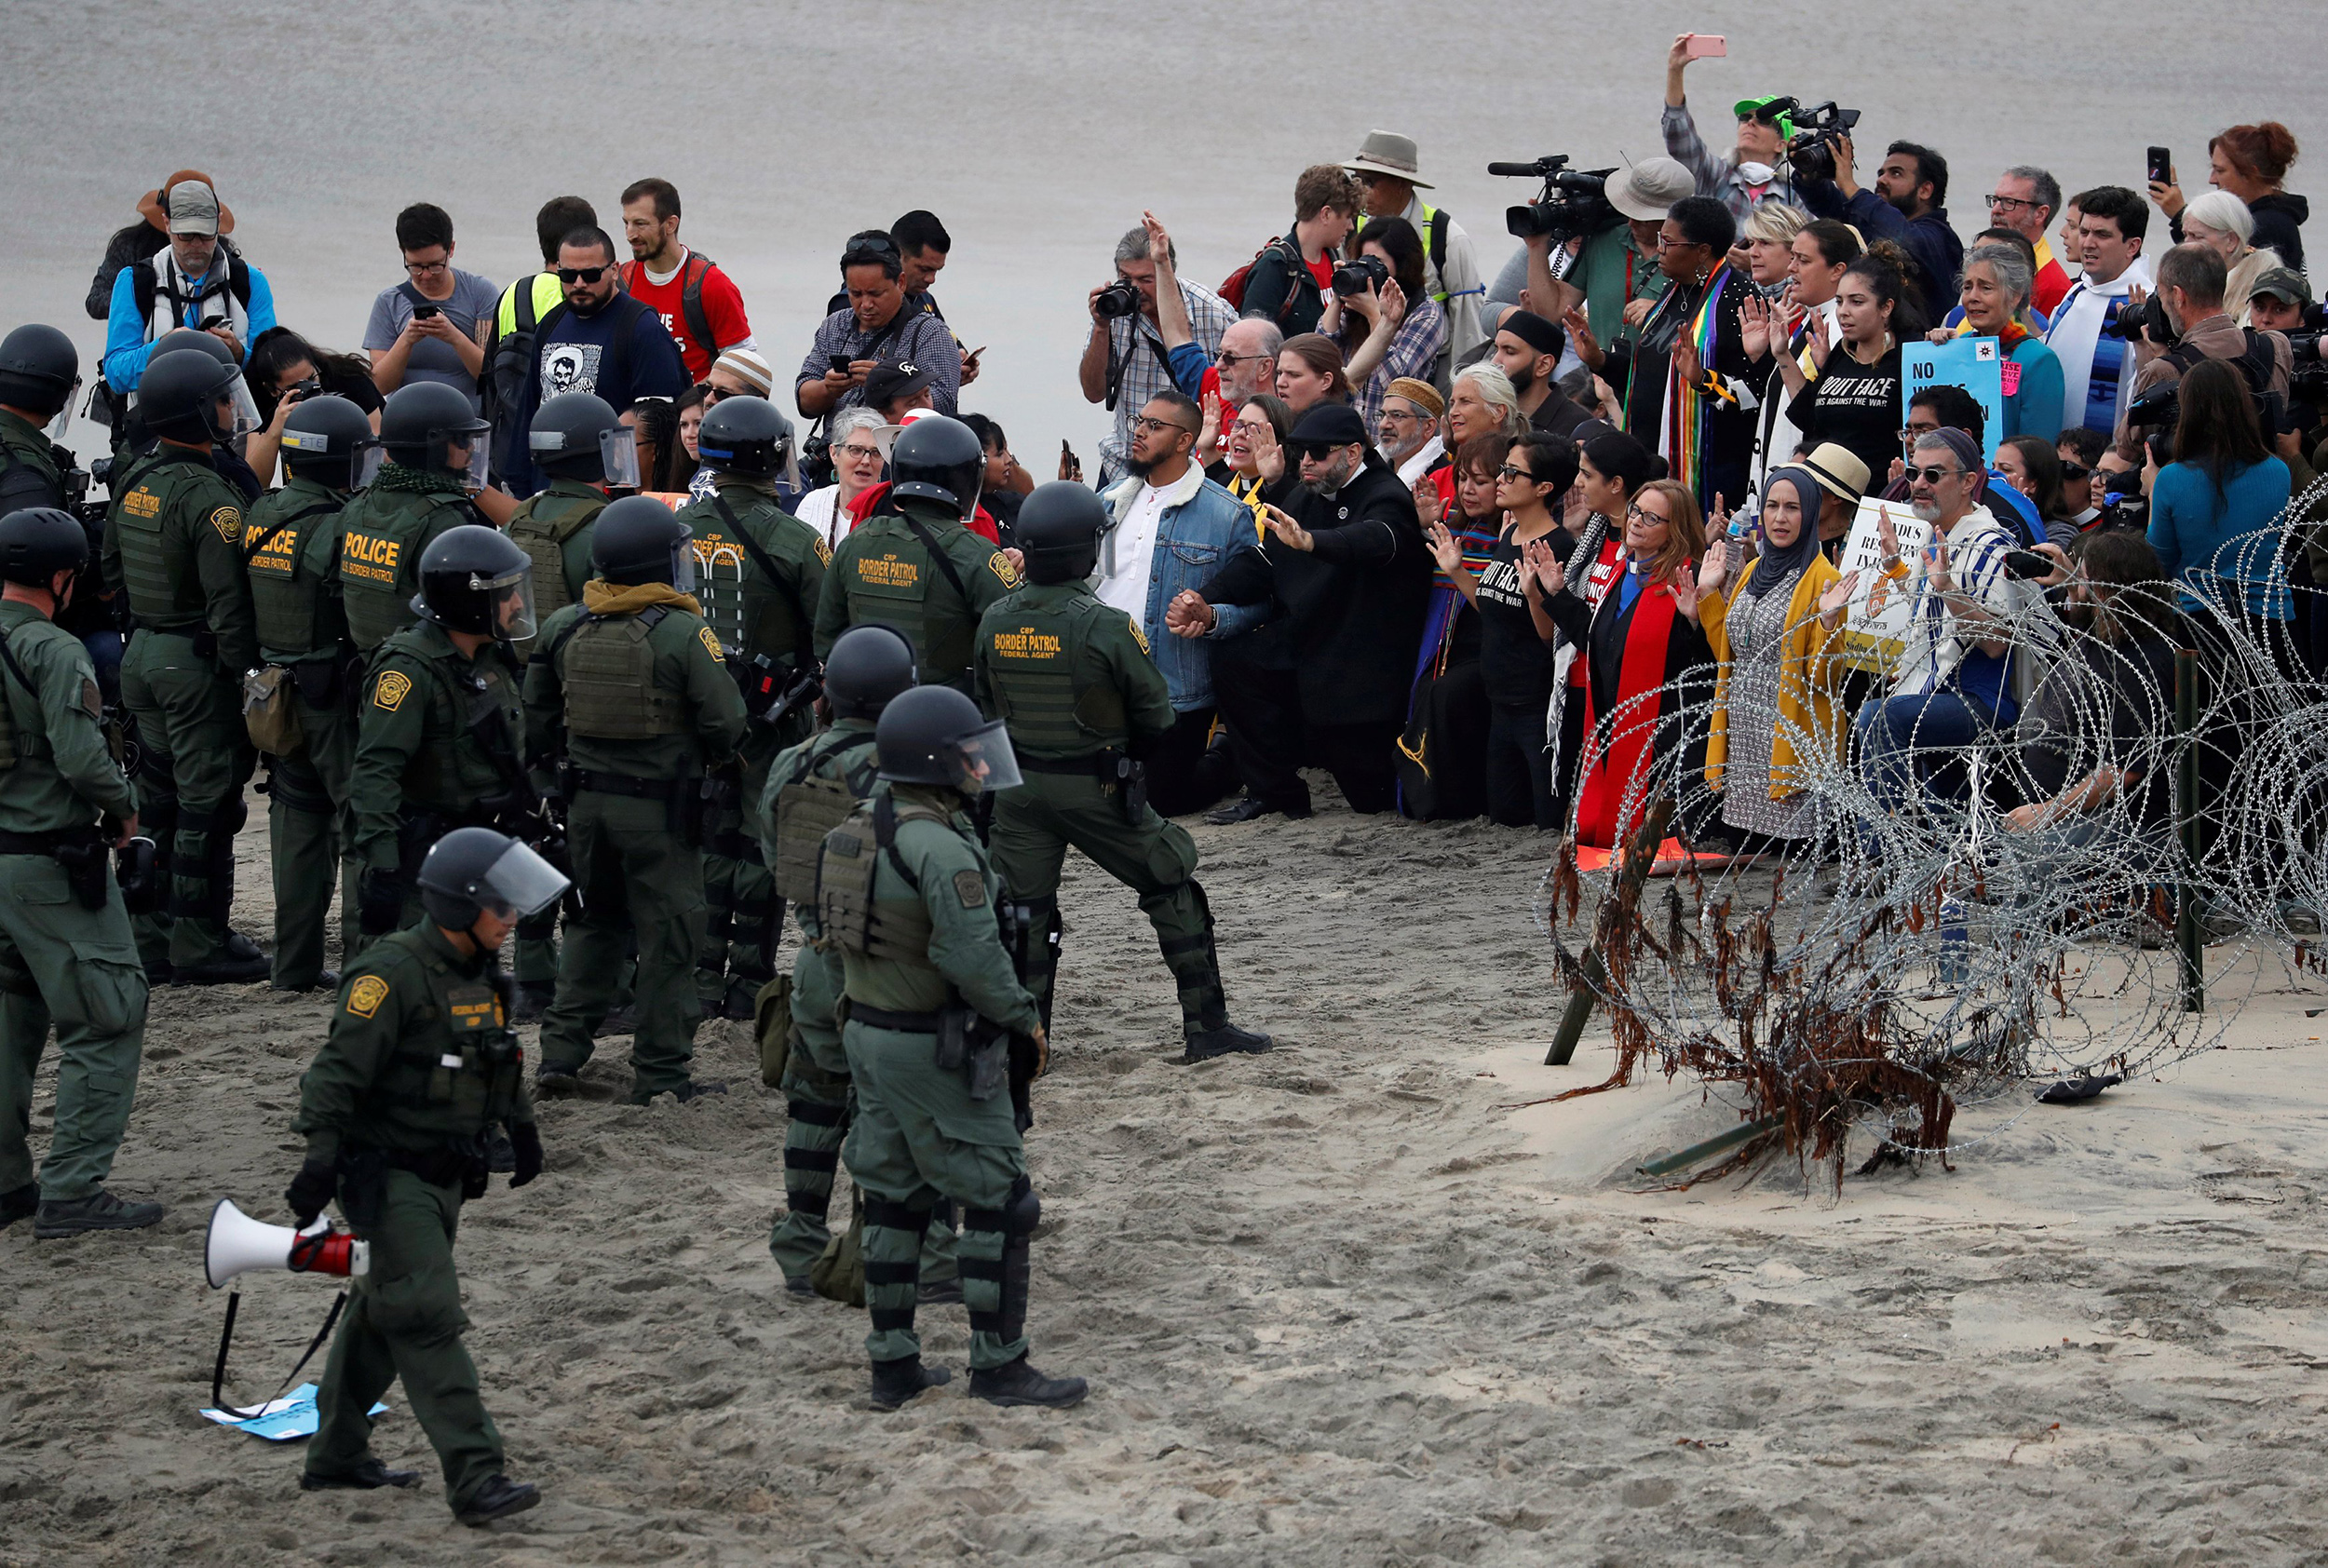 Faith leaders: Migrants have international right to U.S. asylum